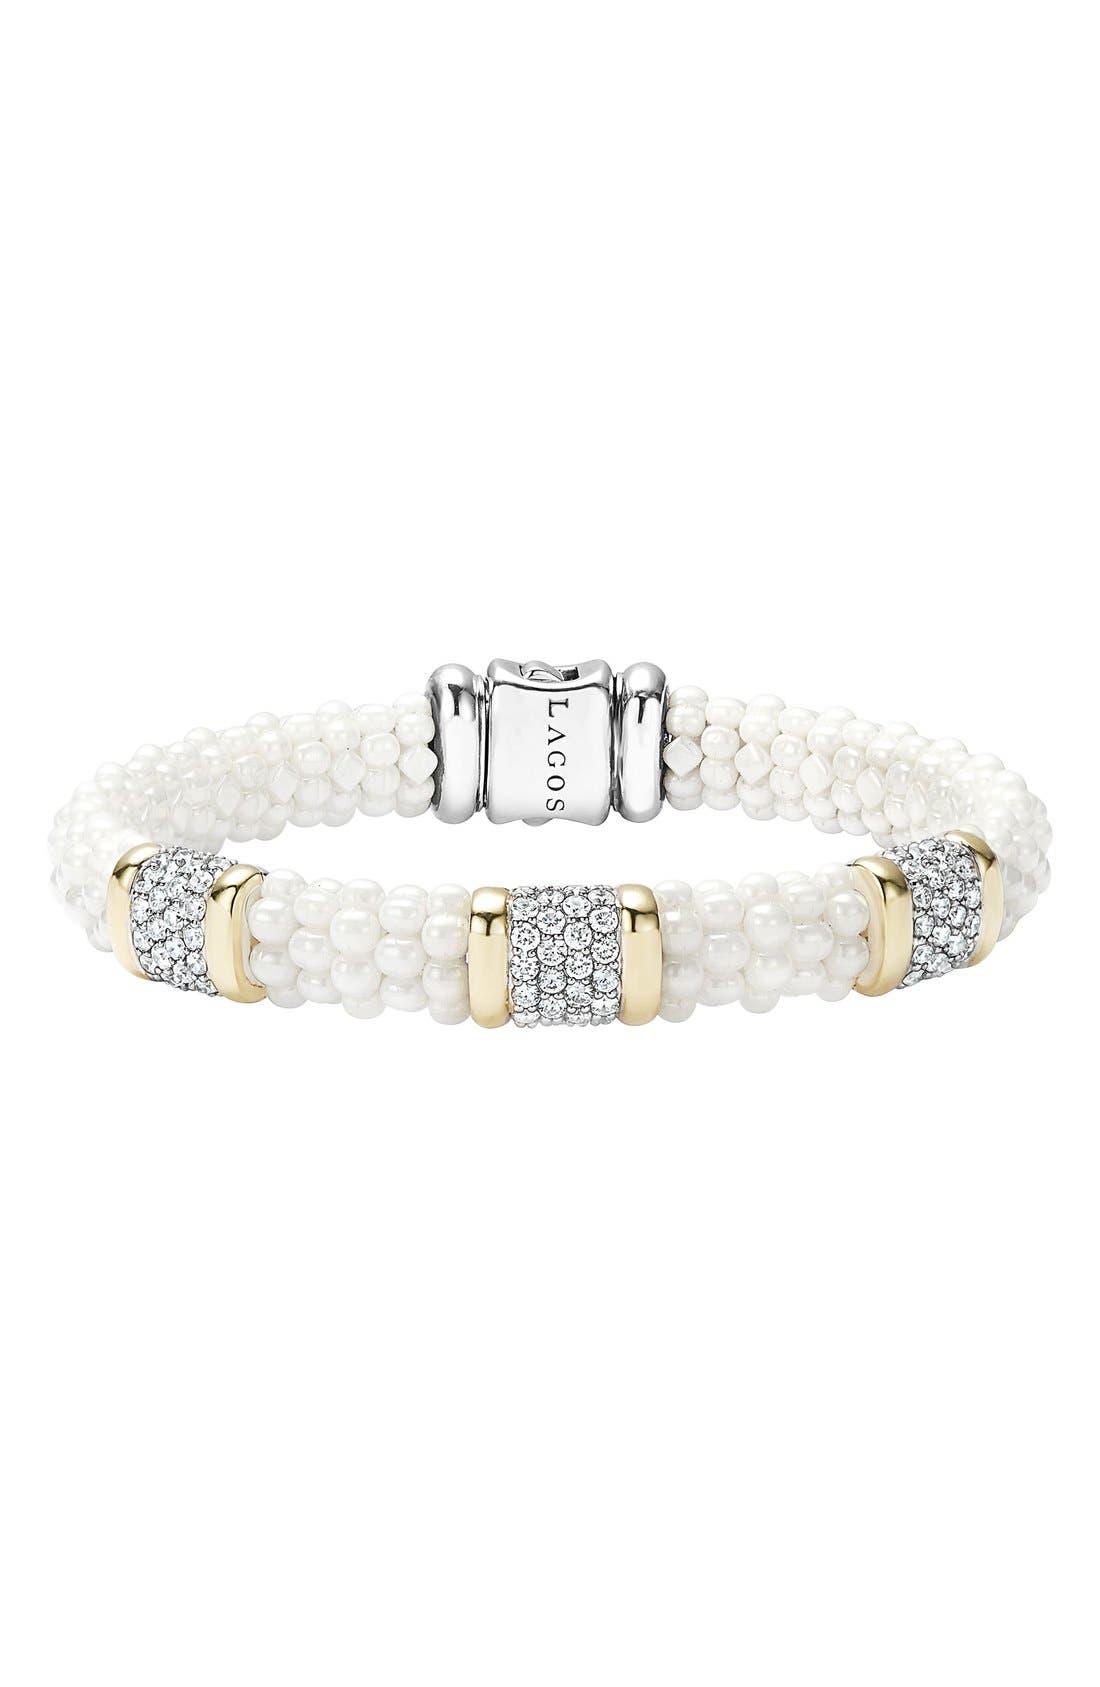 LAGOS 'White Caviar' Three Station Diamond Bracelet